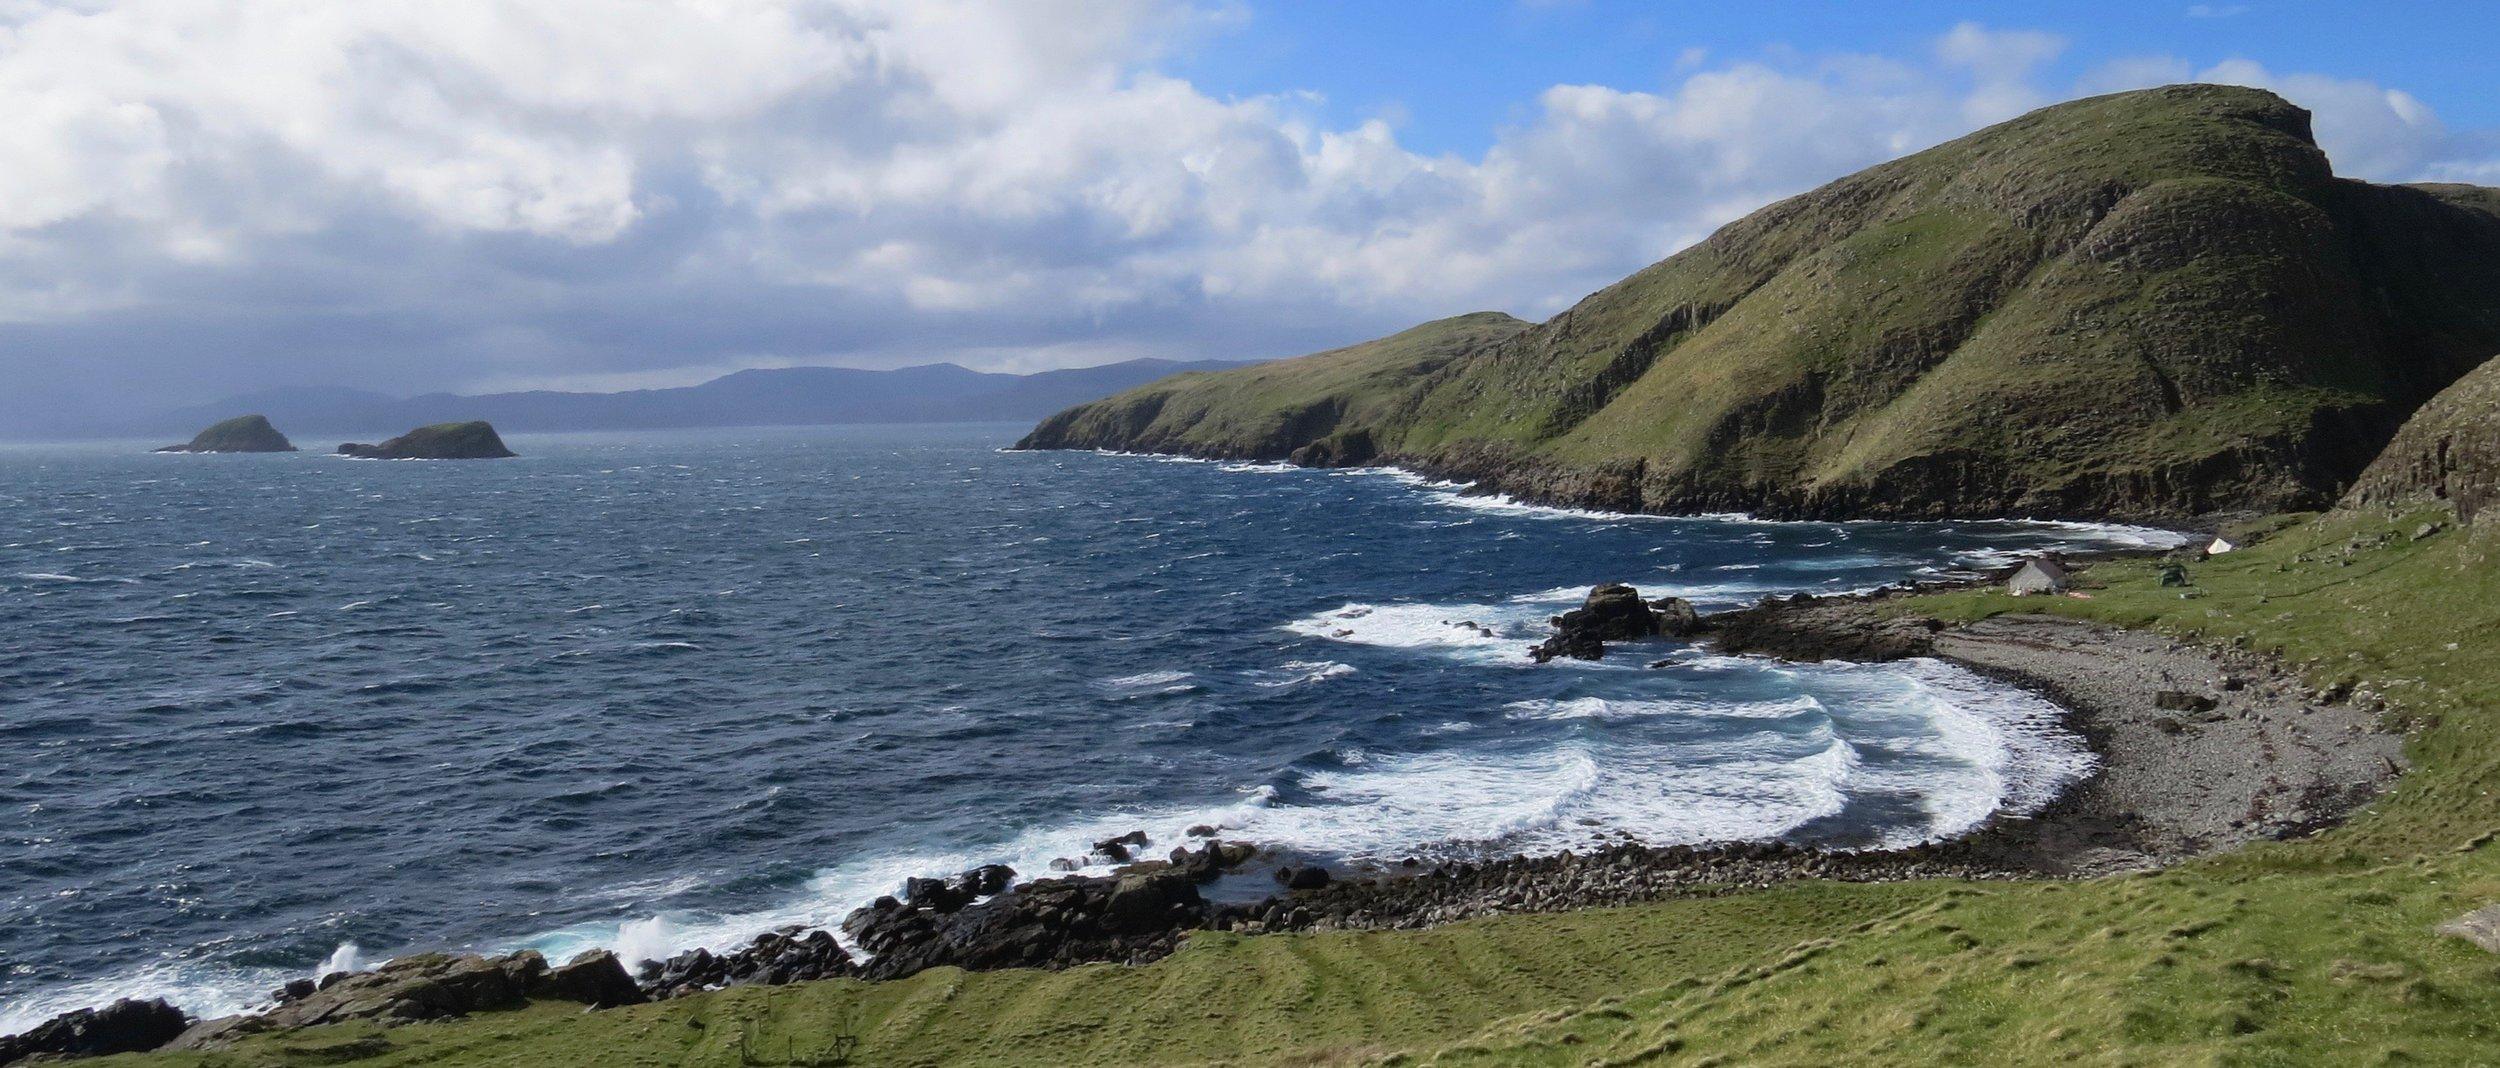 The Shiant Isles, Outer Hebrides, Scotland